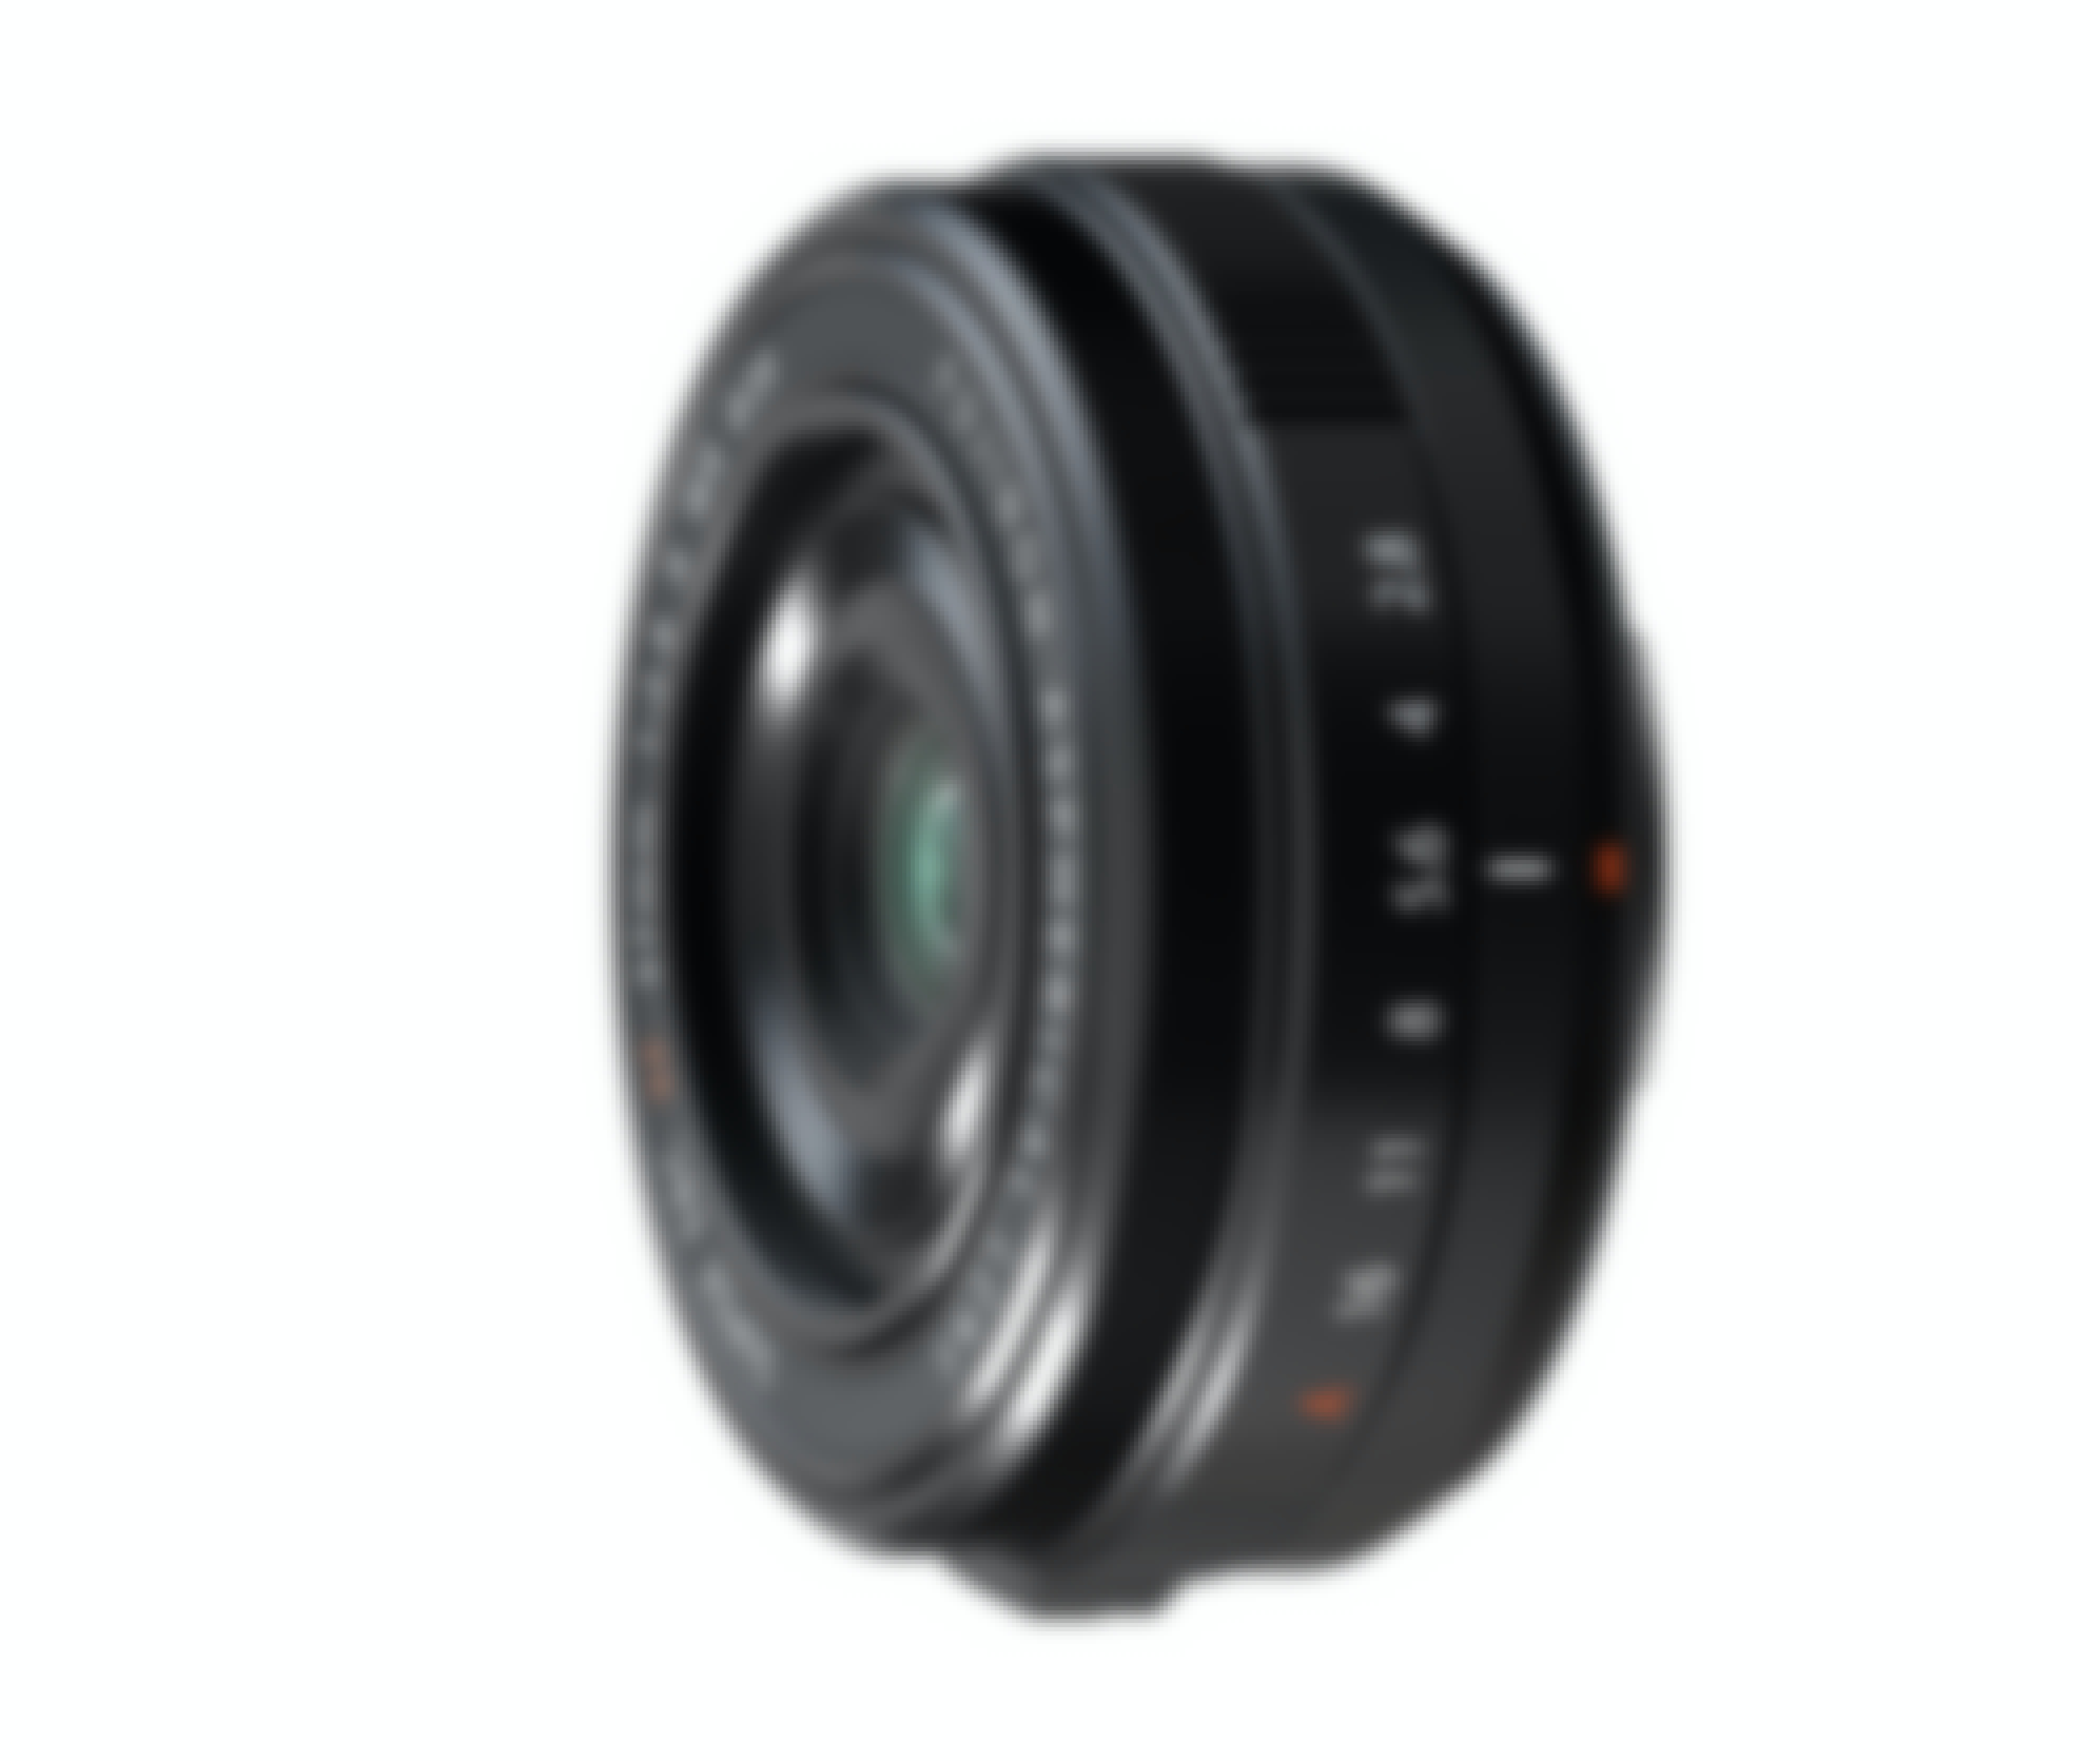 Fujifilm Fujinon XF 27mm F2.8 R WR